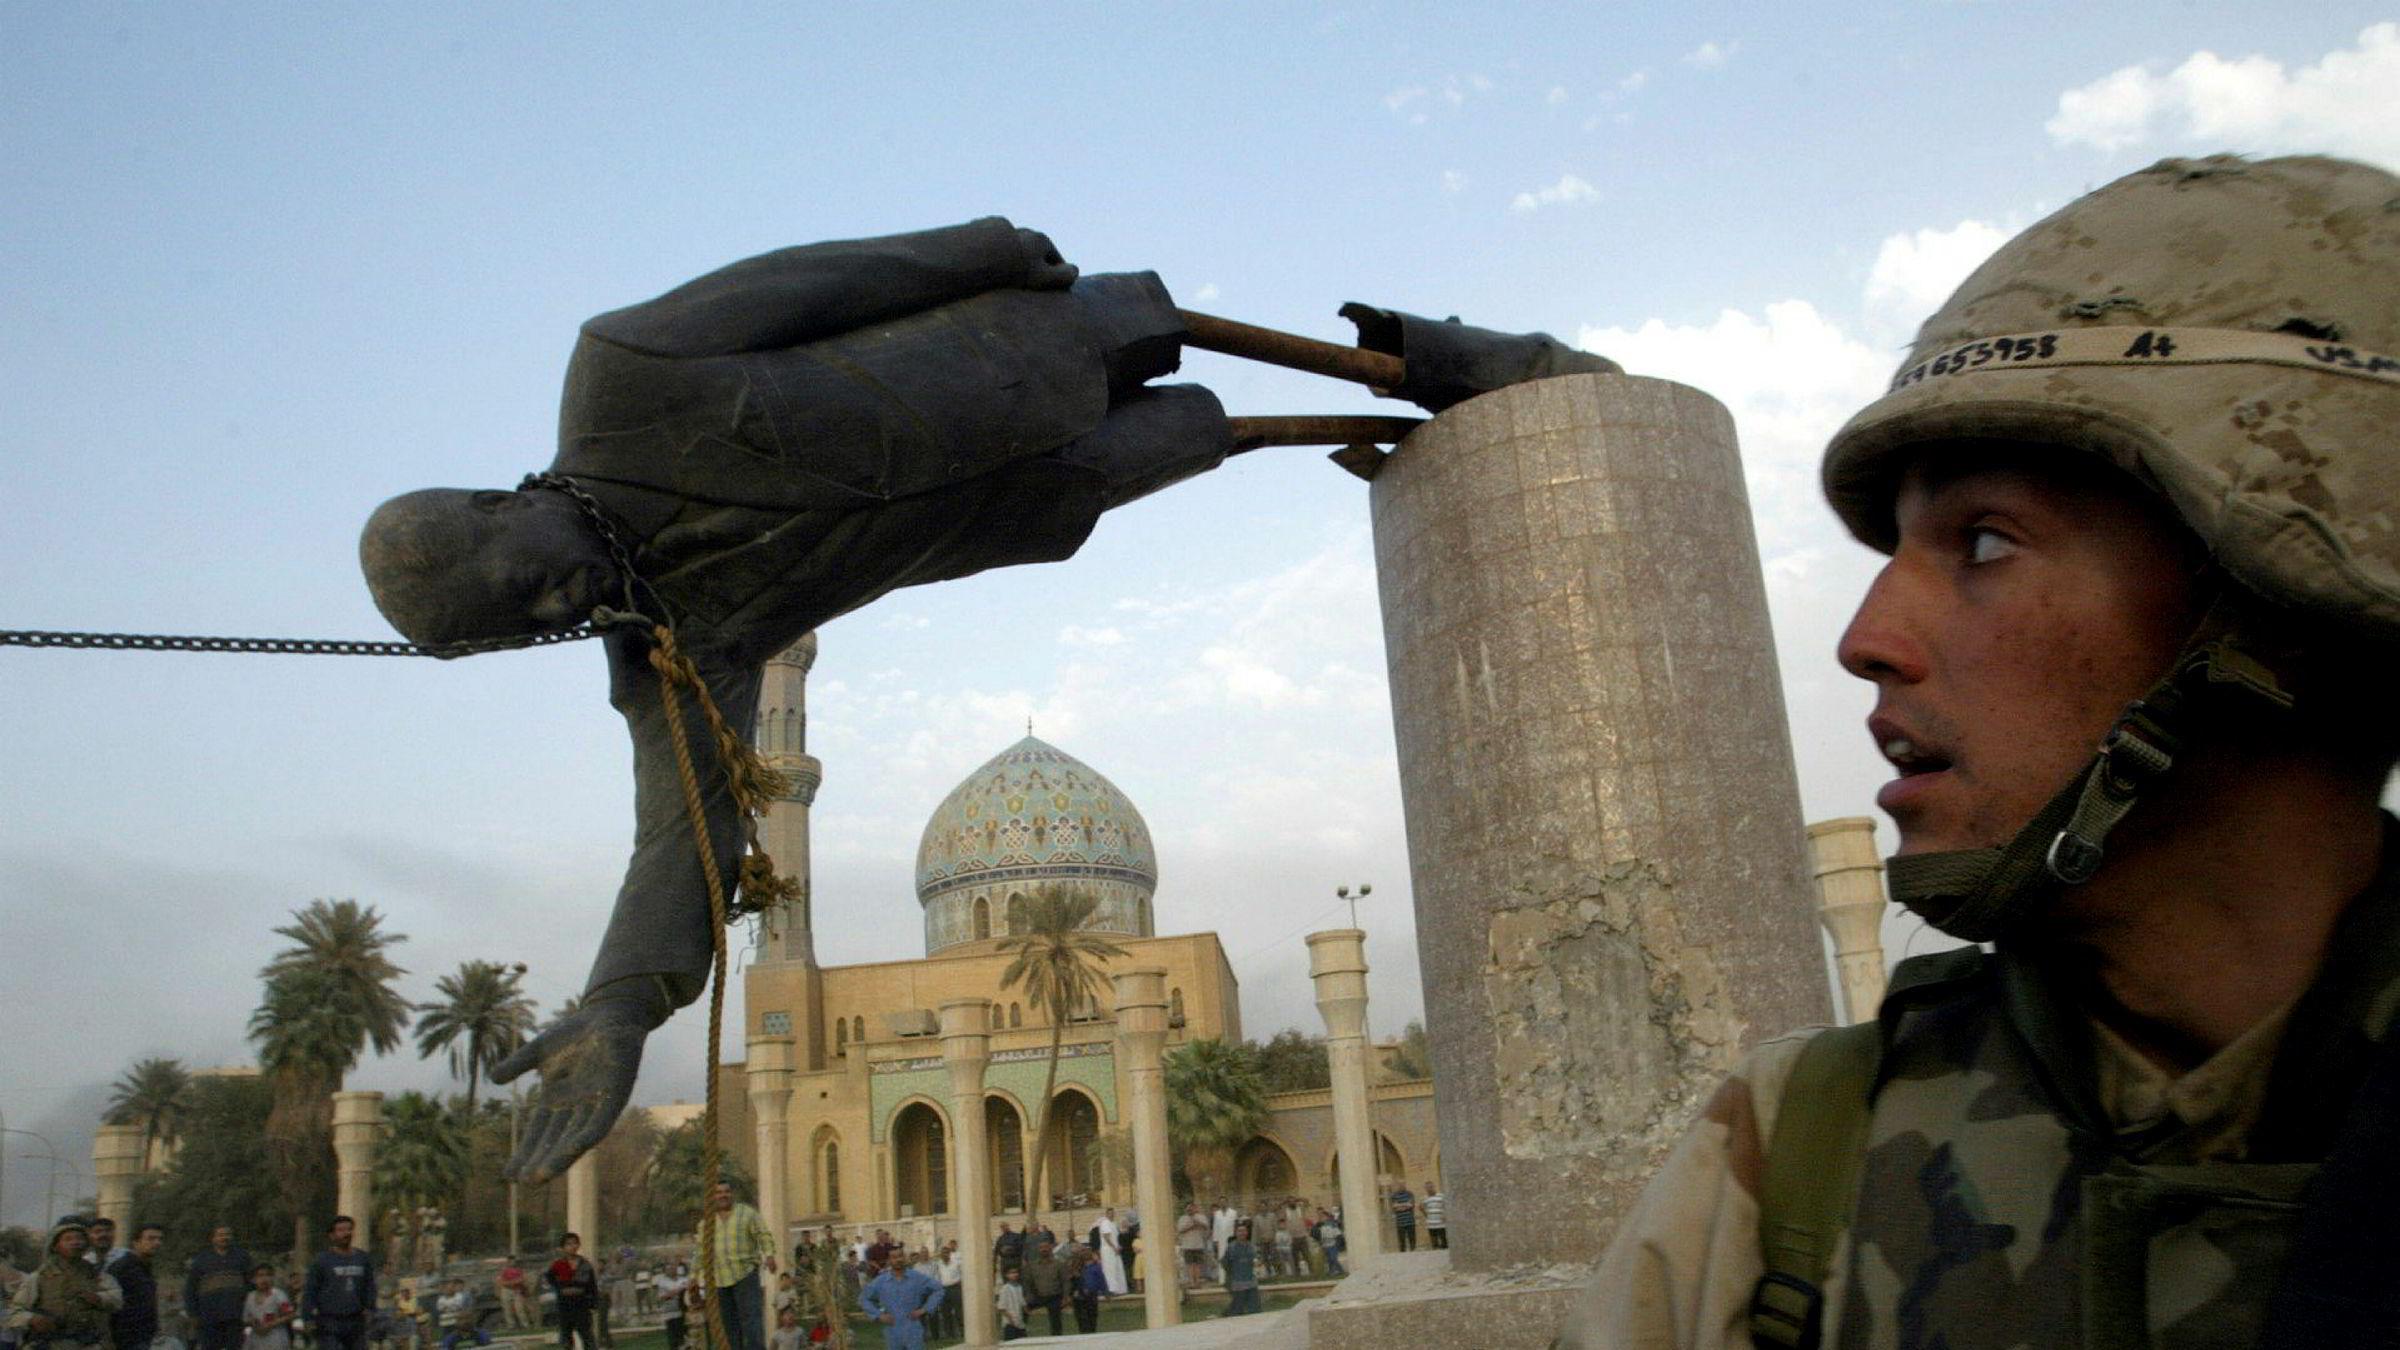 Amerikanske soldater ser på at en statue av Iraks tidligere president Saddam Hussein faller i Bagdad 9. april 2003.